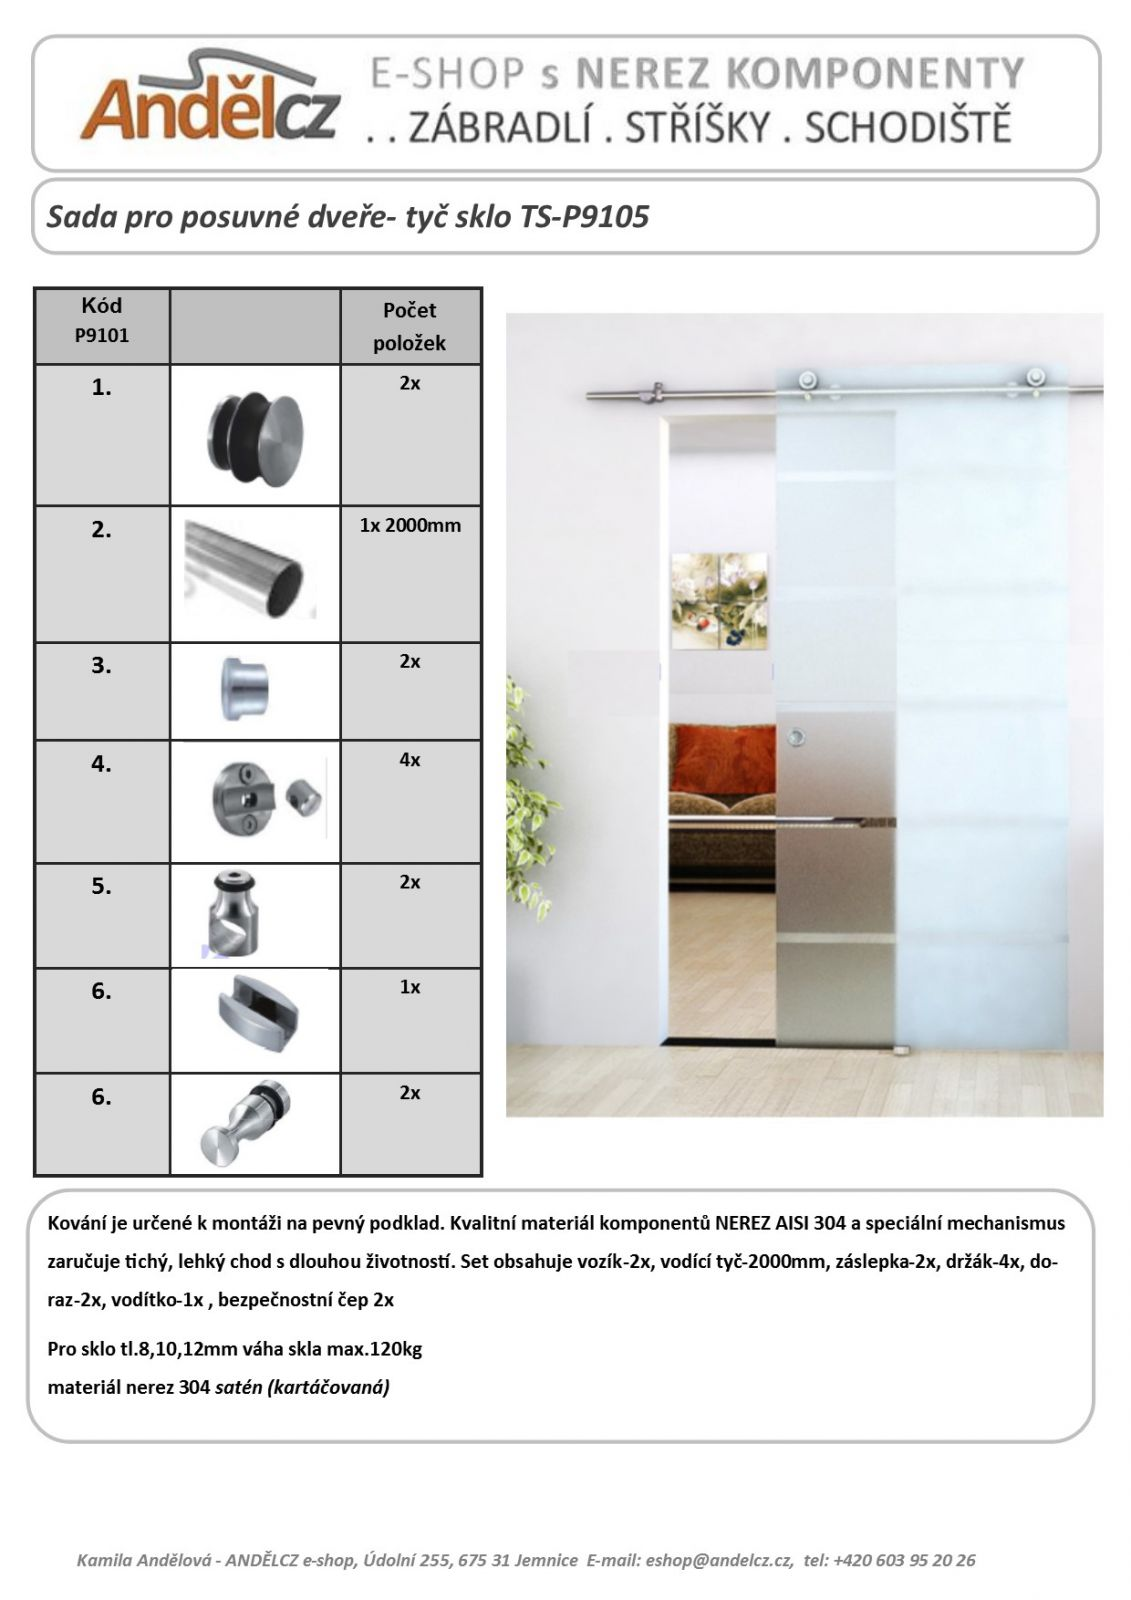 Sada pro posuvné dveře- tyč sklo TS-P9105